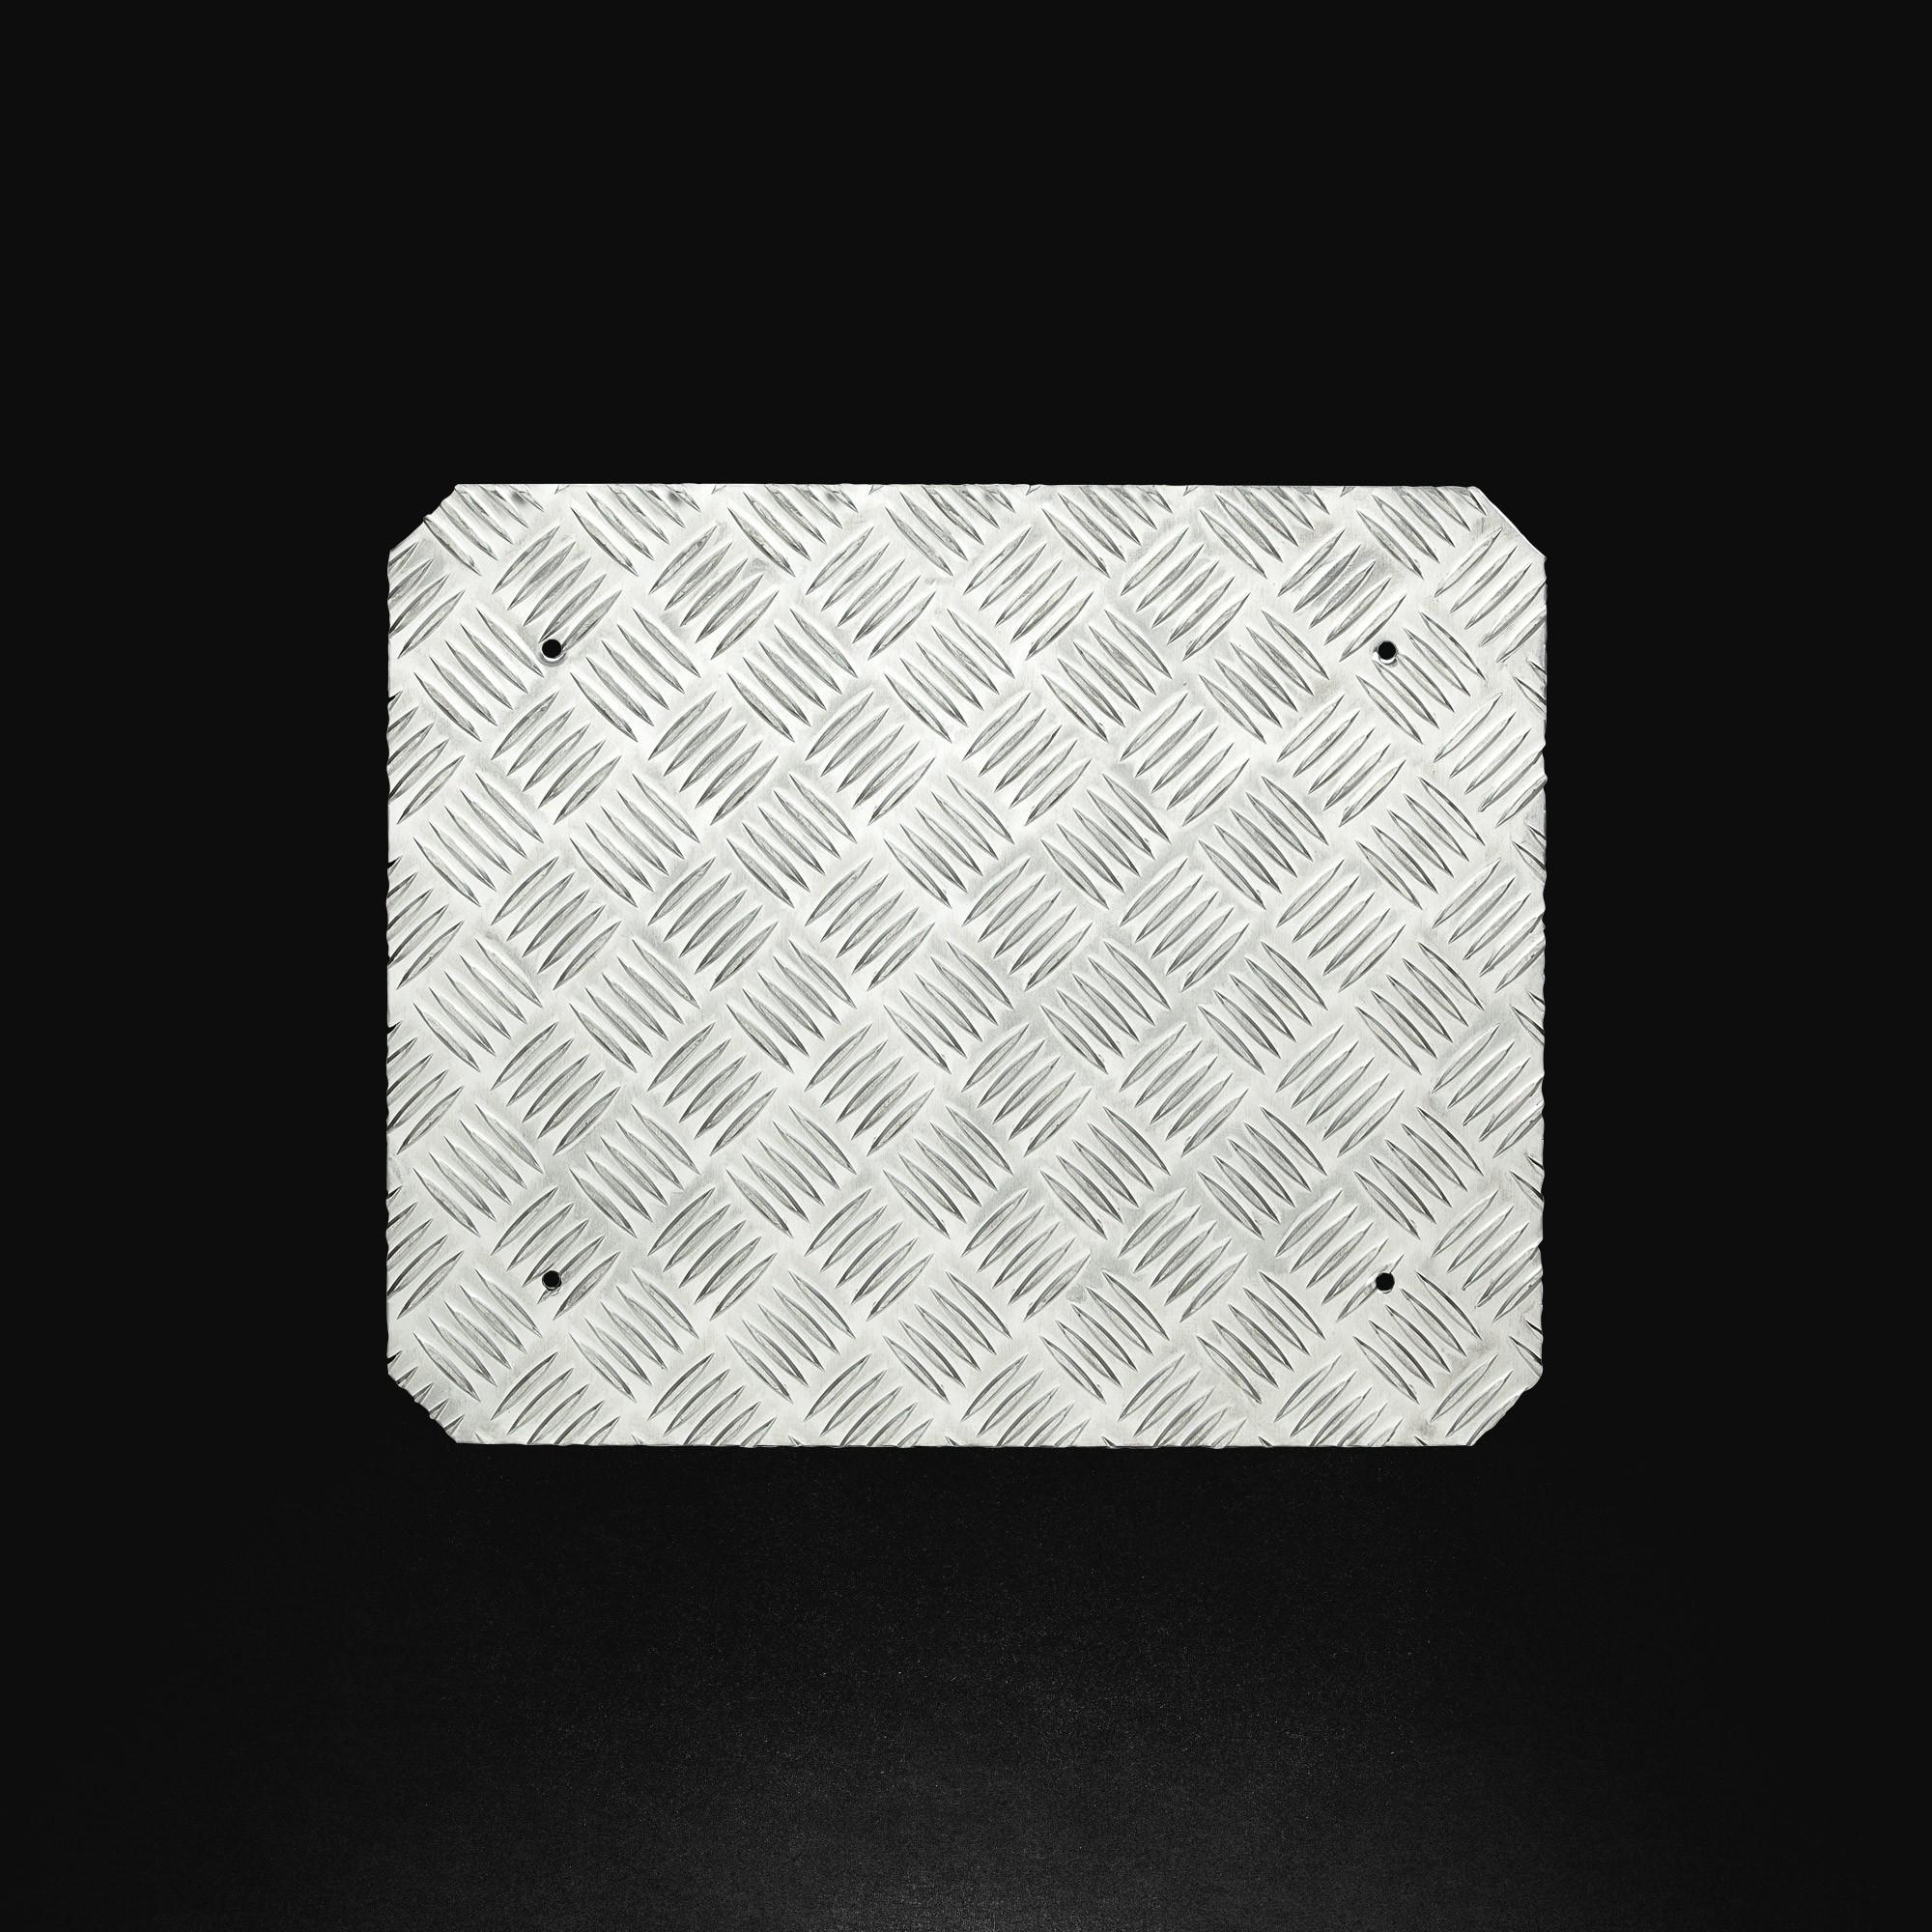 OMP OA//2080 Universal Footrest, Silver